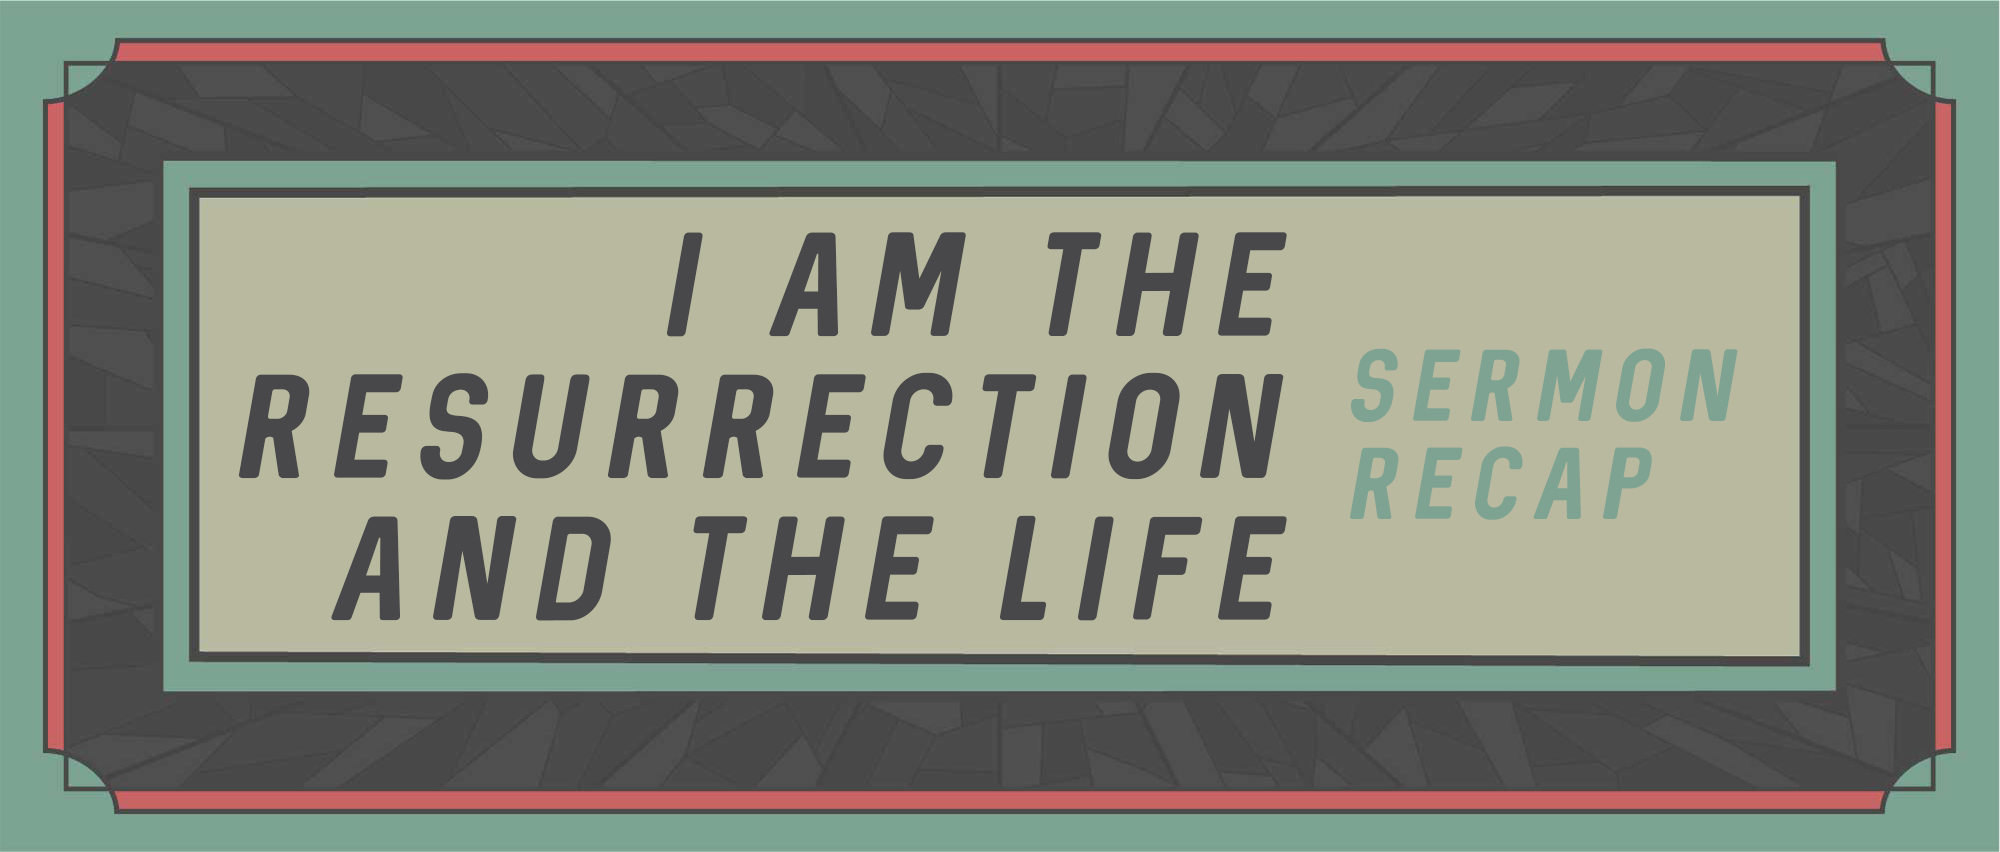 IAM_way Resurrection.jpg